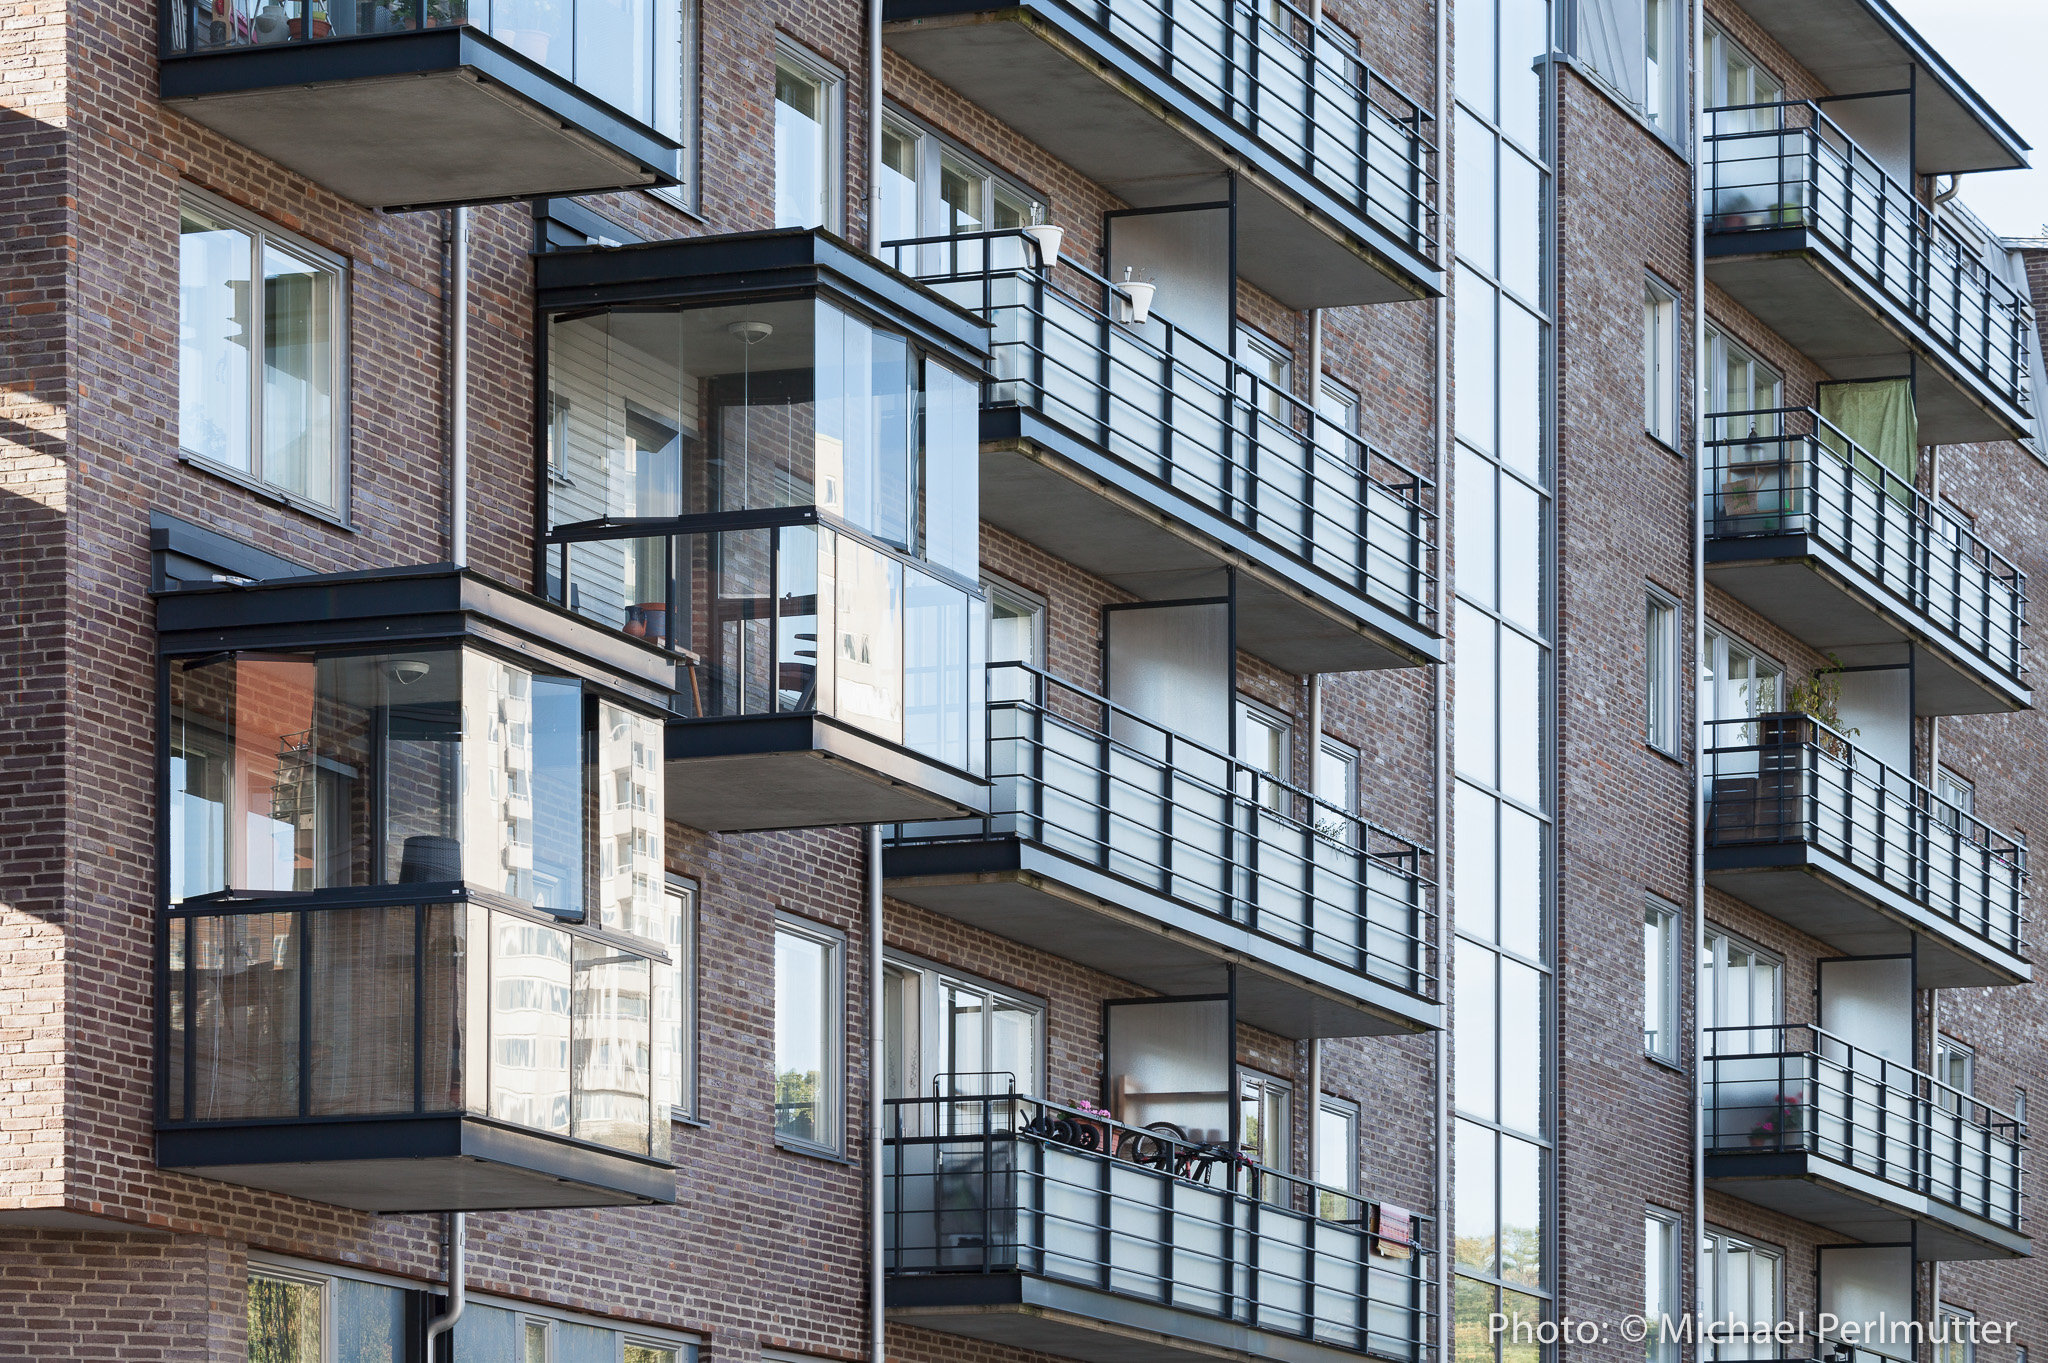 Lagbasen 1, Årstadal, Stockholm